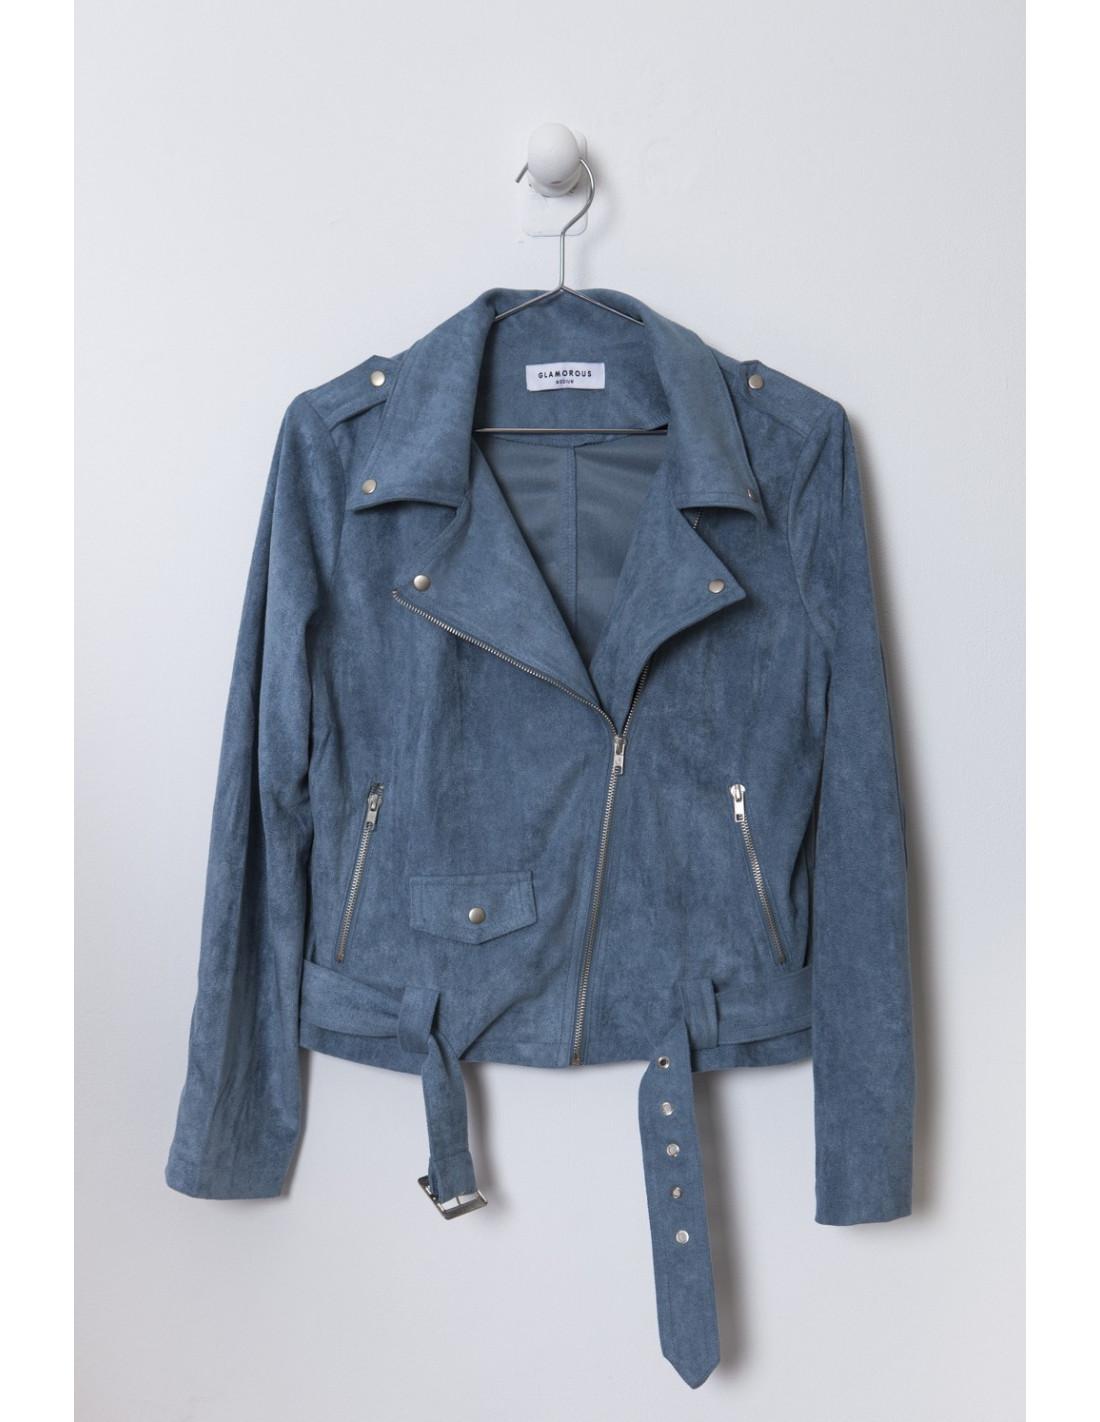 f0e3759556fdd Cazadora biker azul Glamorours